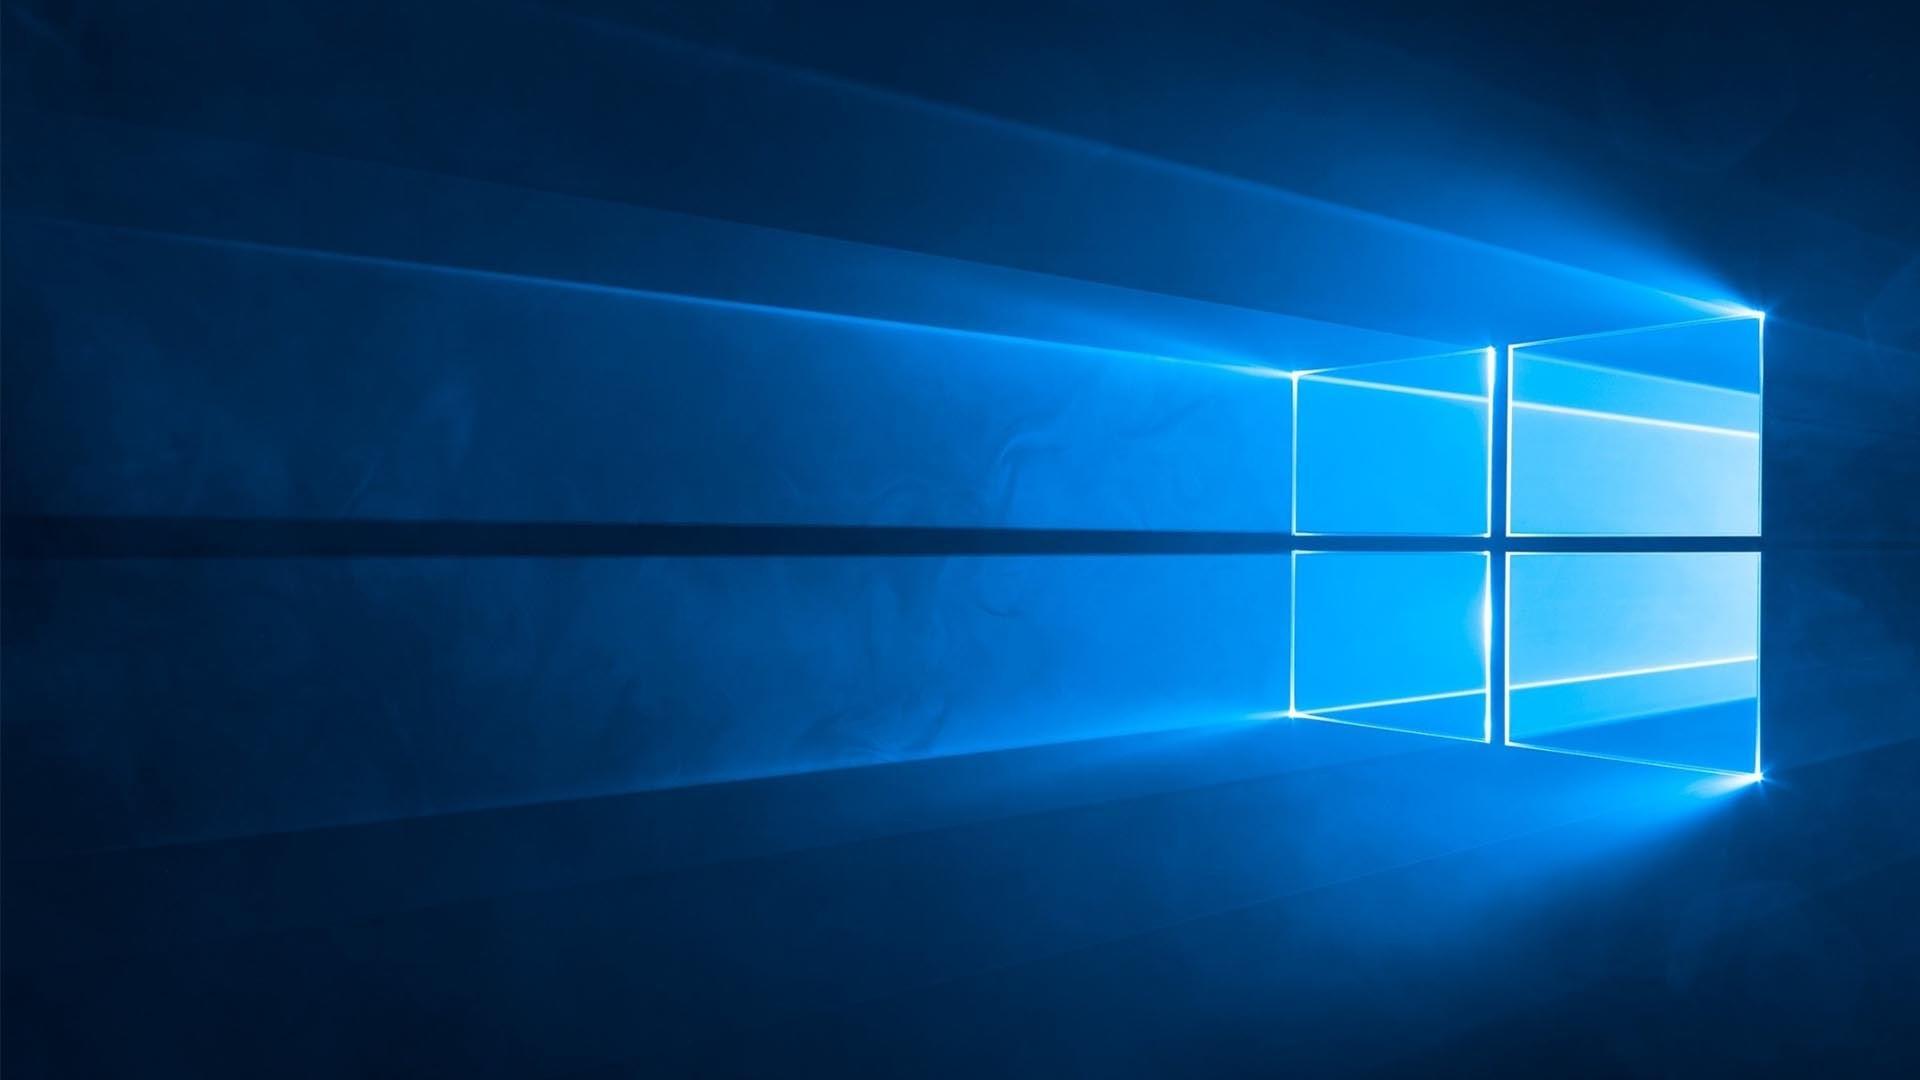 Home Screen Wallpaper Windows 10 76 Images